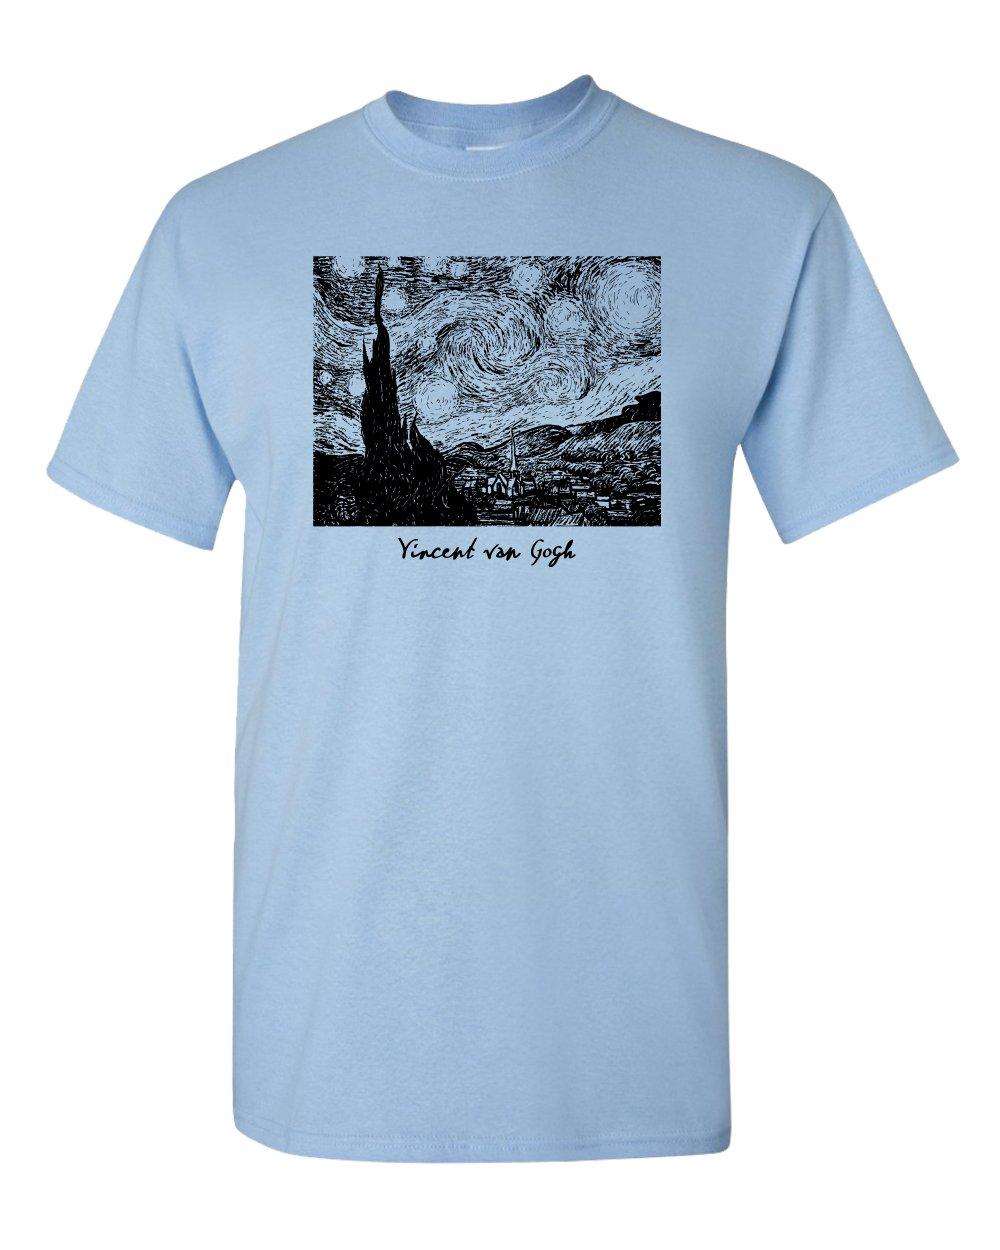 Starry Night Vincent Van Gogh Painting Dutch France French Art S Tshirt